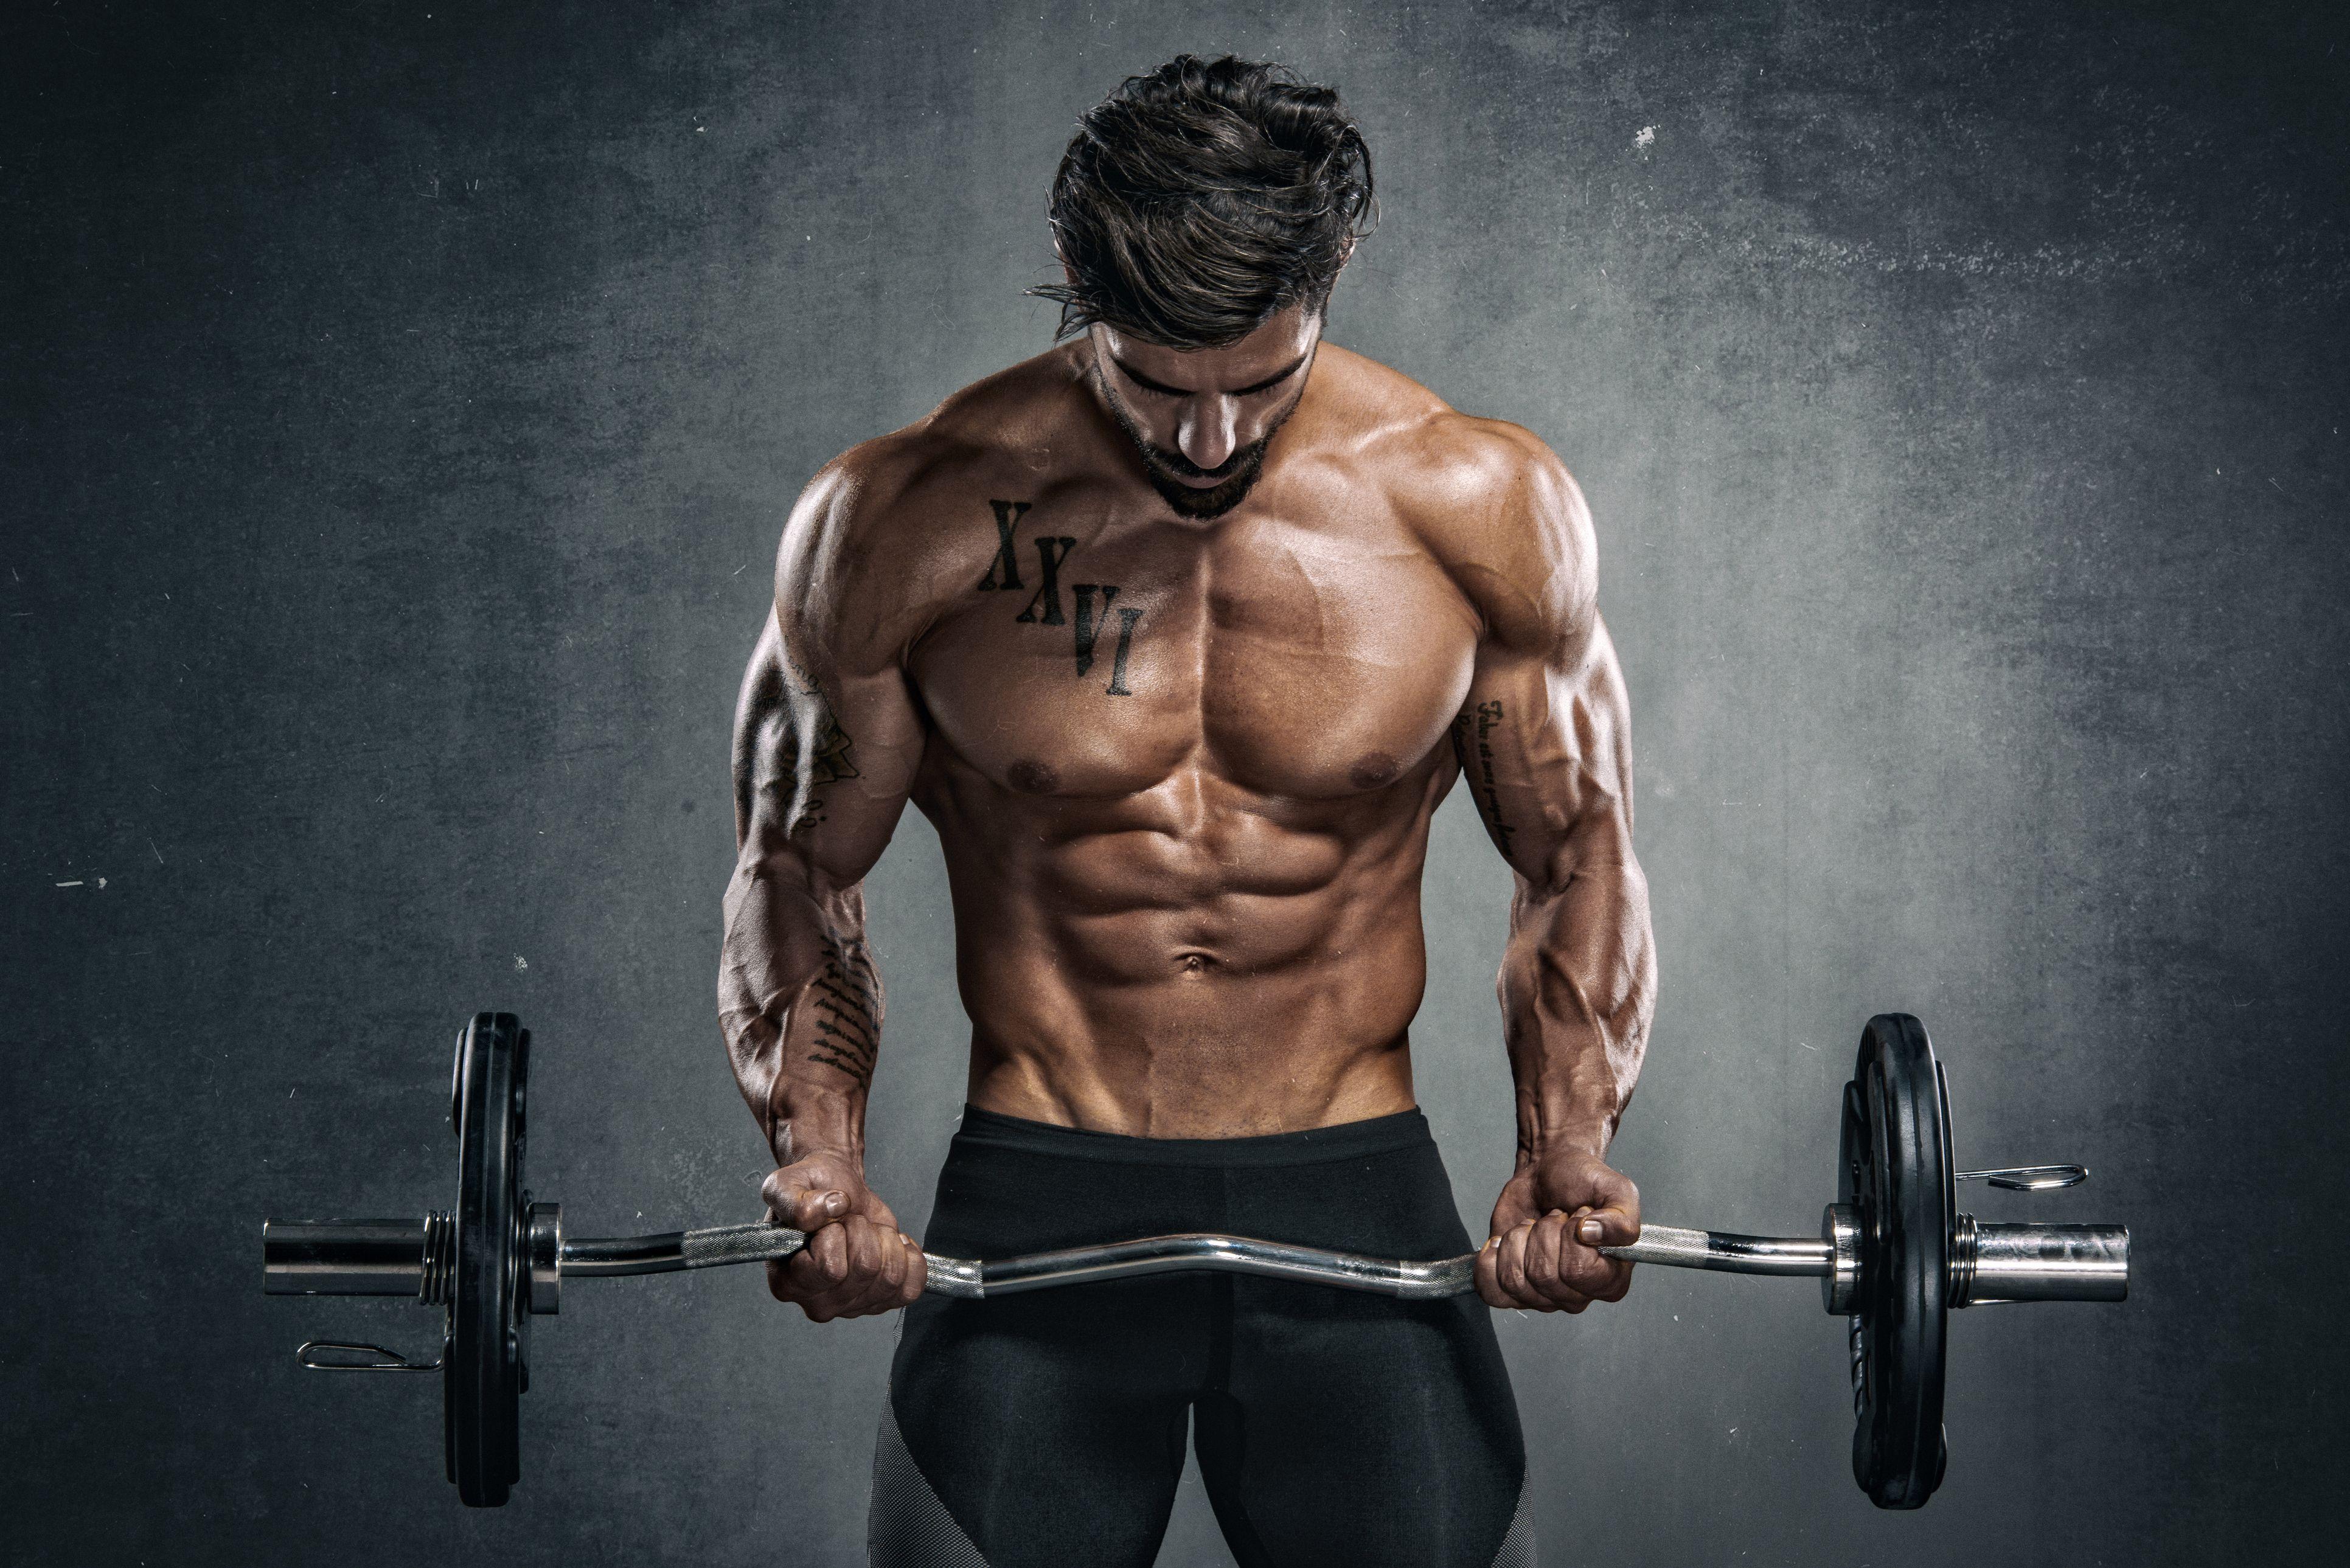 Gym man photo